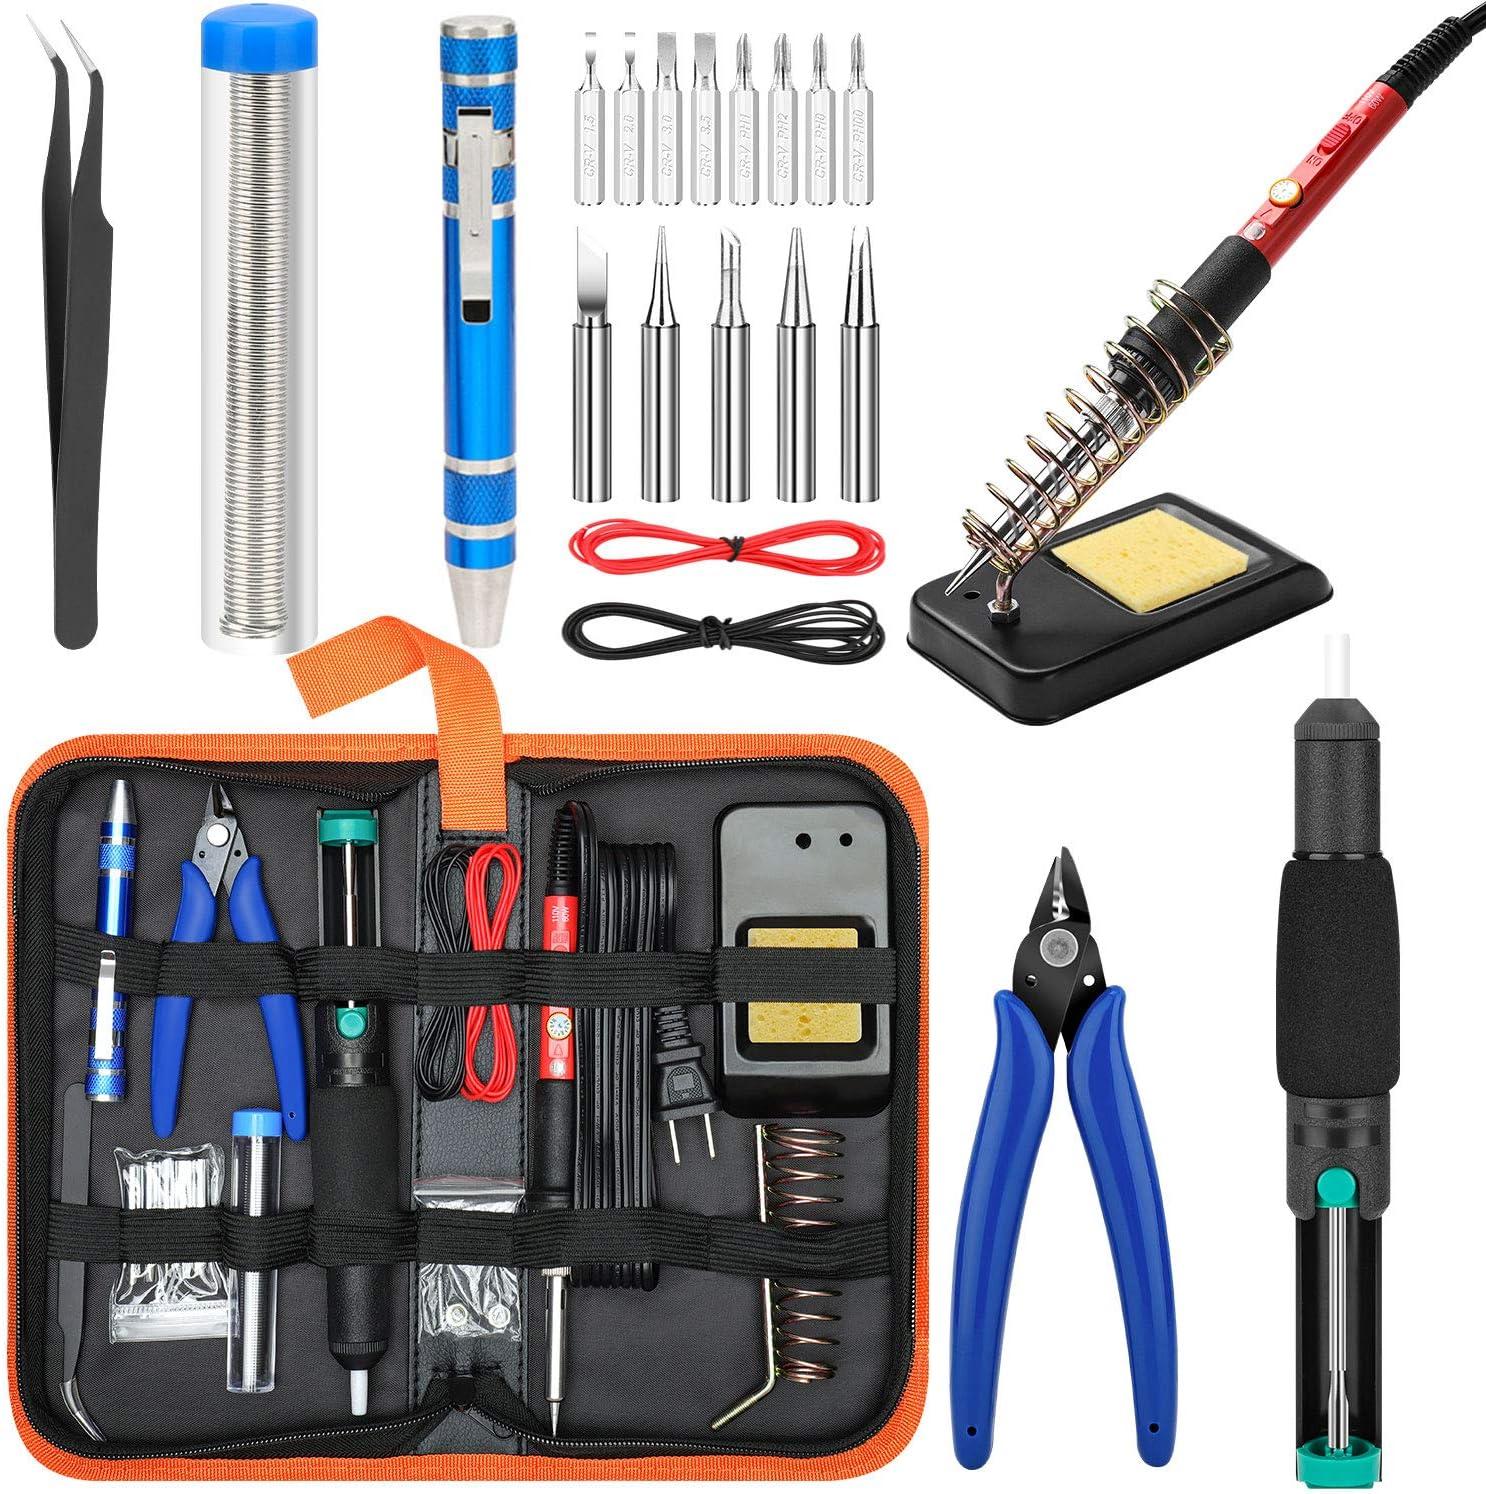 5pcs Solder Iron Tip Kit for Temperature Adjust Soldering Electric Welding 907